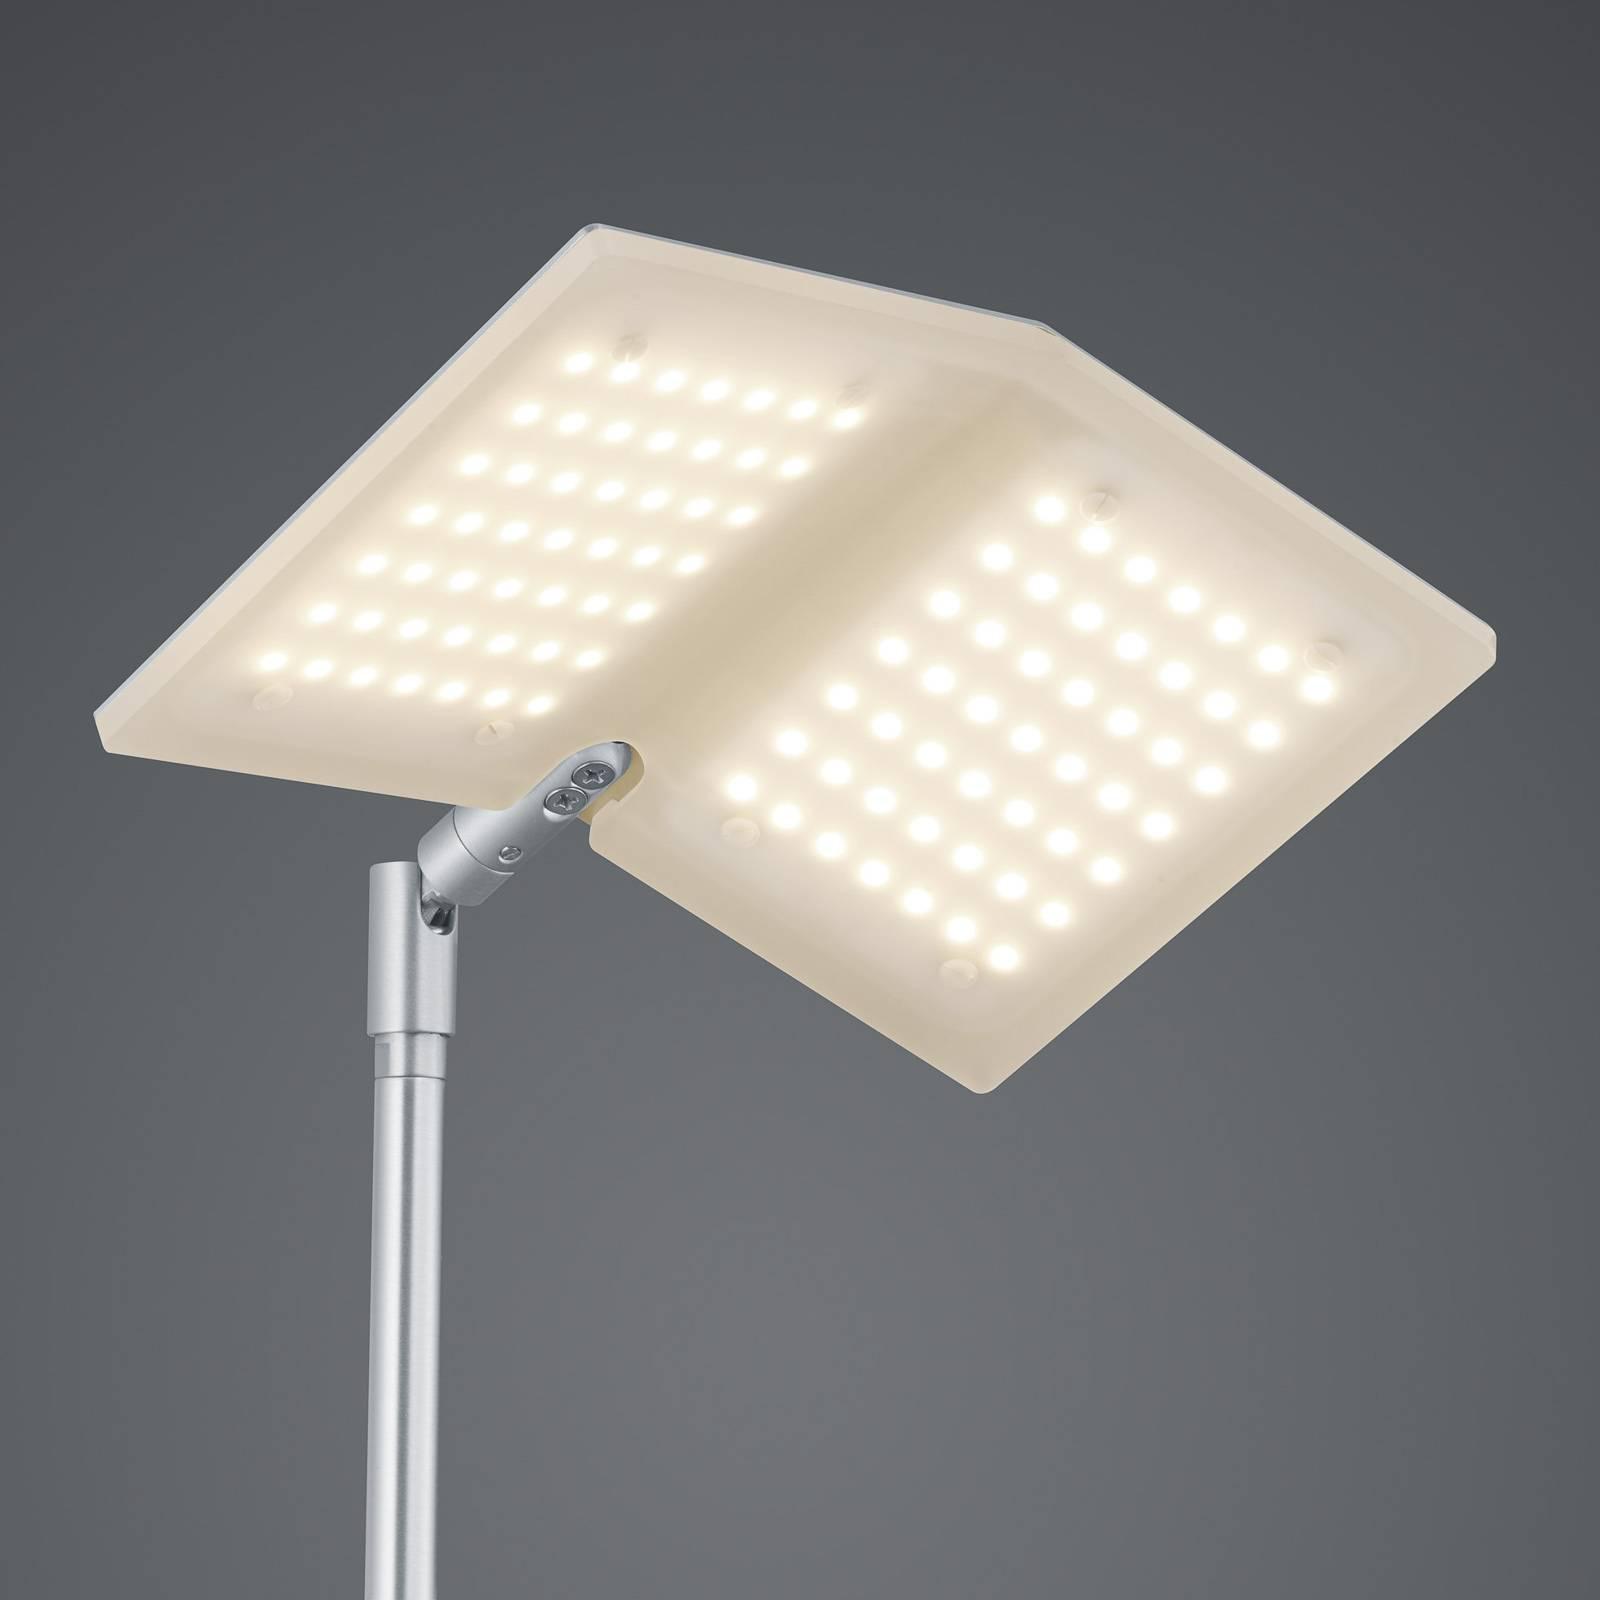 BANKAMP Book LED-lattiavalaisin, matta nikkeli